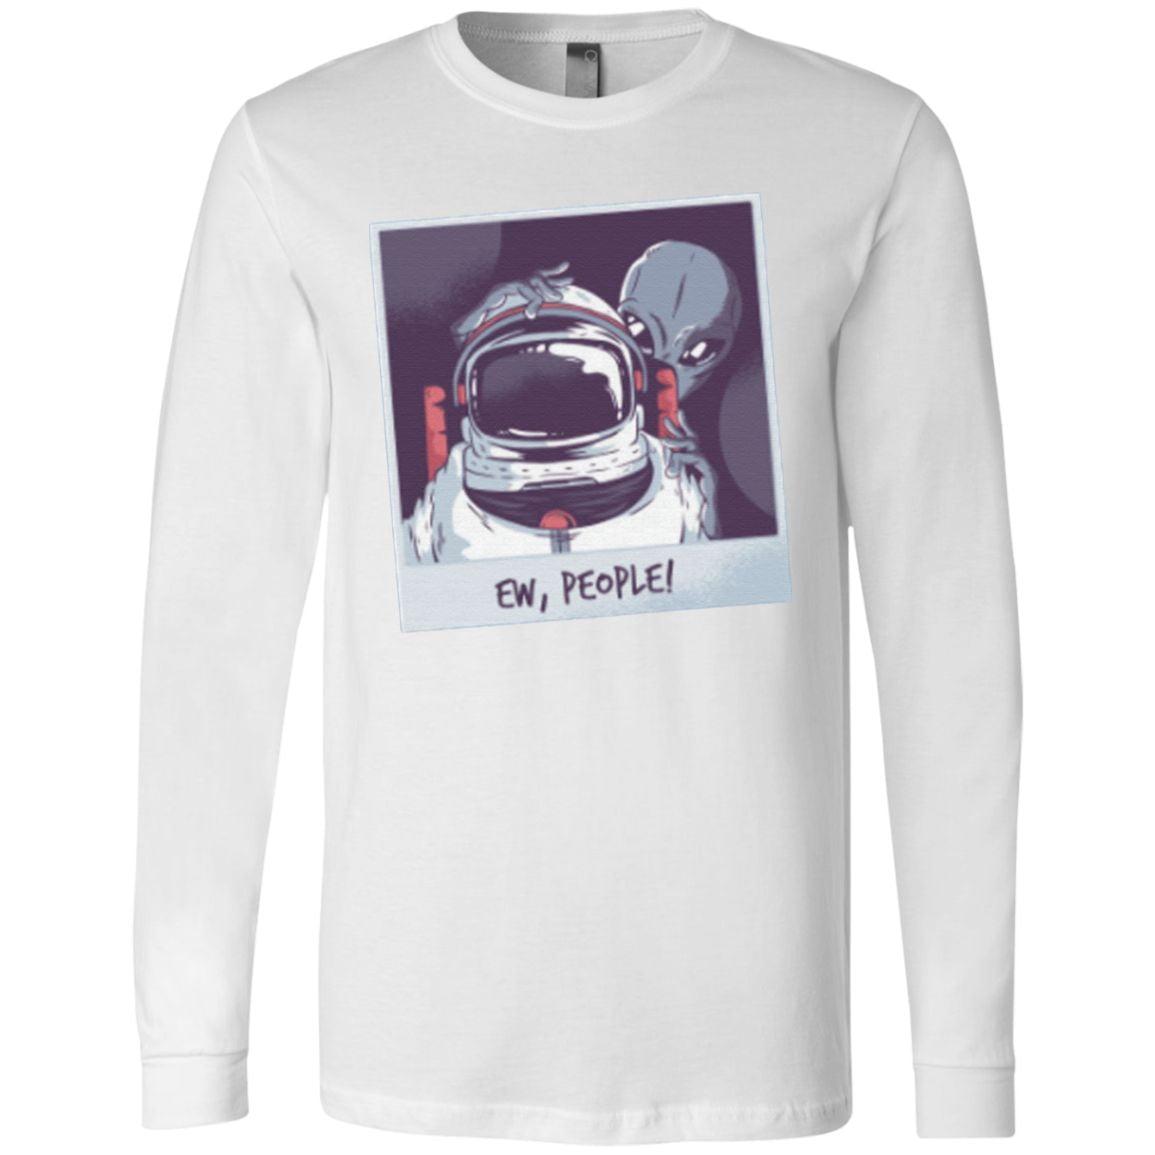 Ew People Aliens astronauts T-Shirt